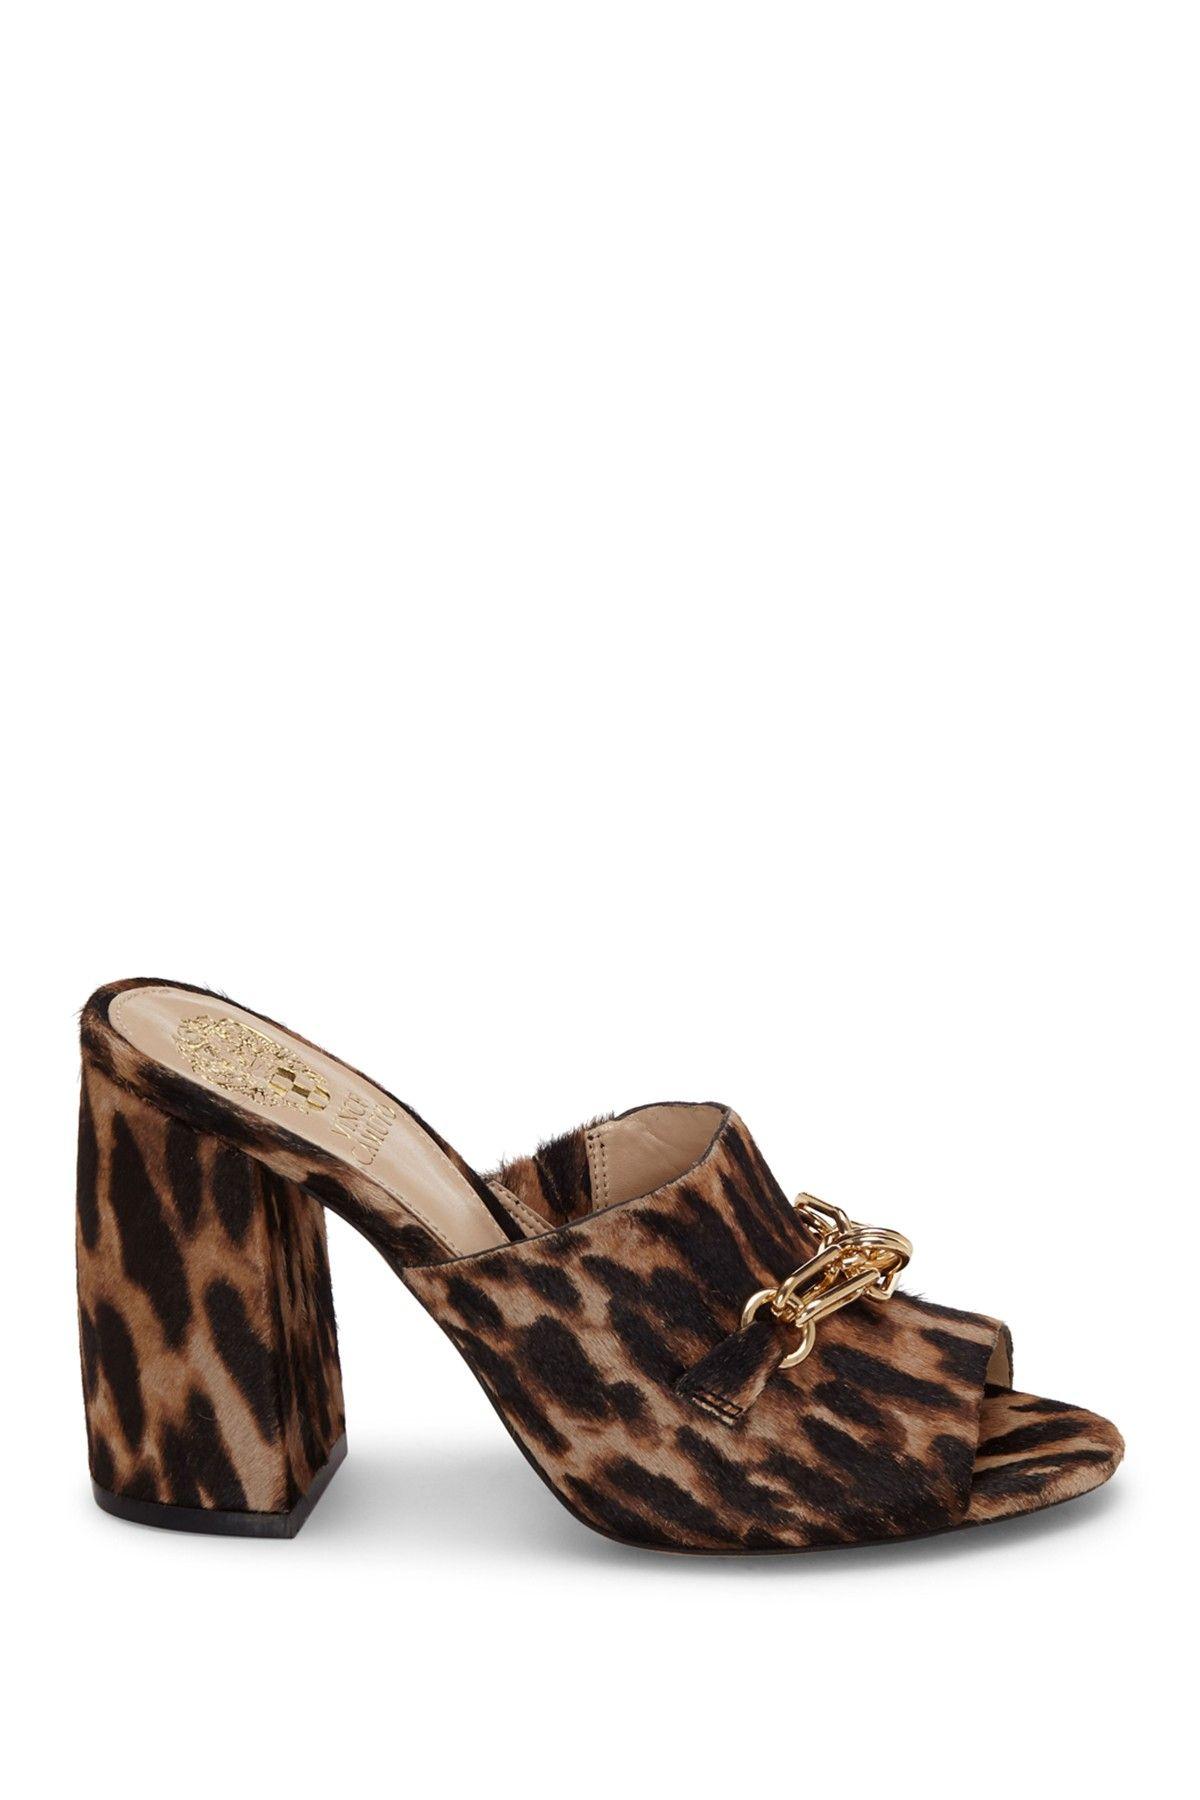 Vince Camuto Gessien 3 Genuine Calf Hair Slide Sandal Nordstrom Rack In 2020 Slide Sandals Calves Hair Slide